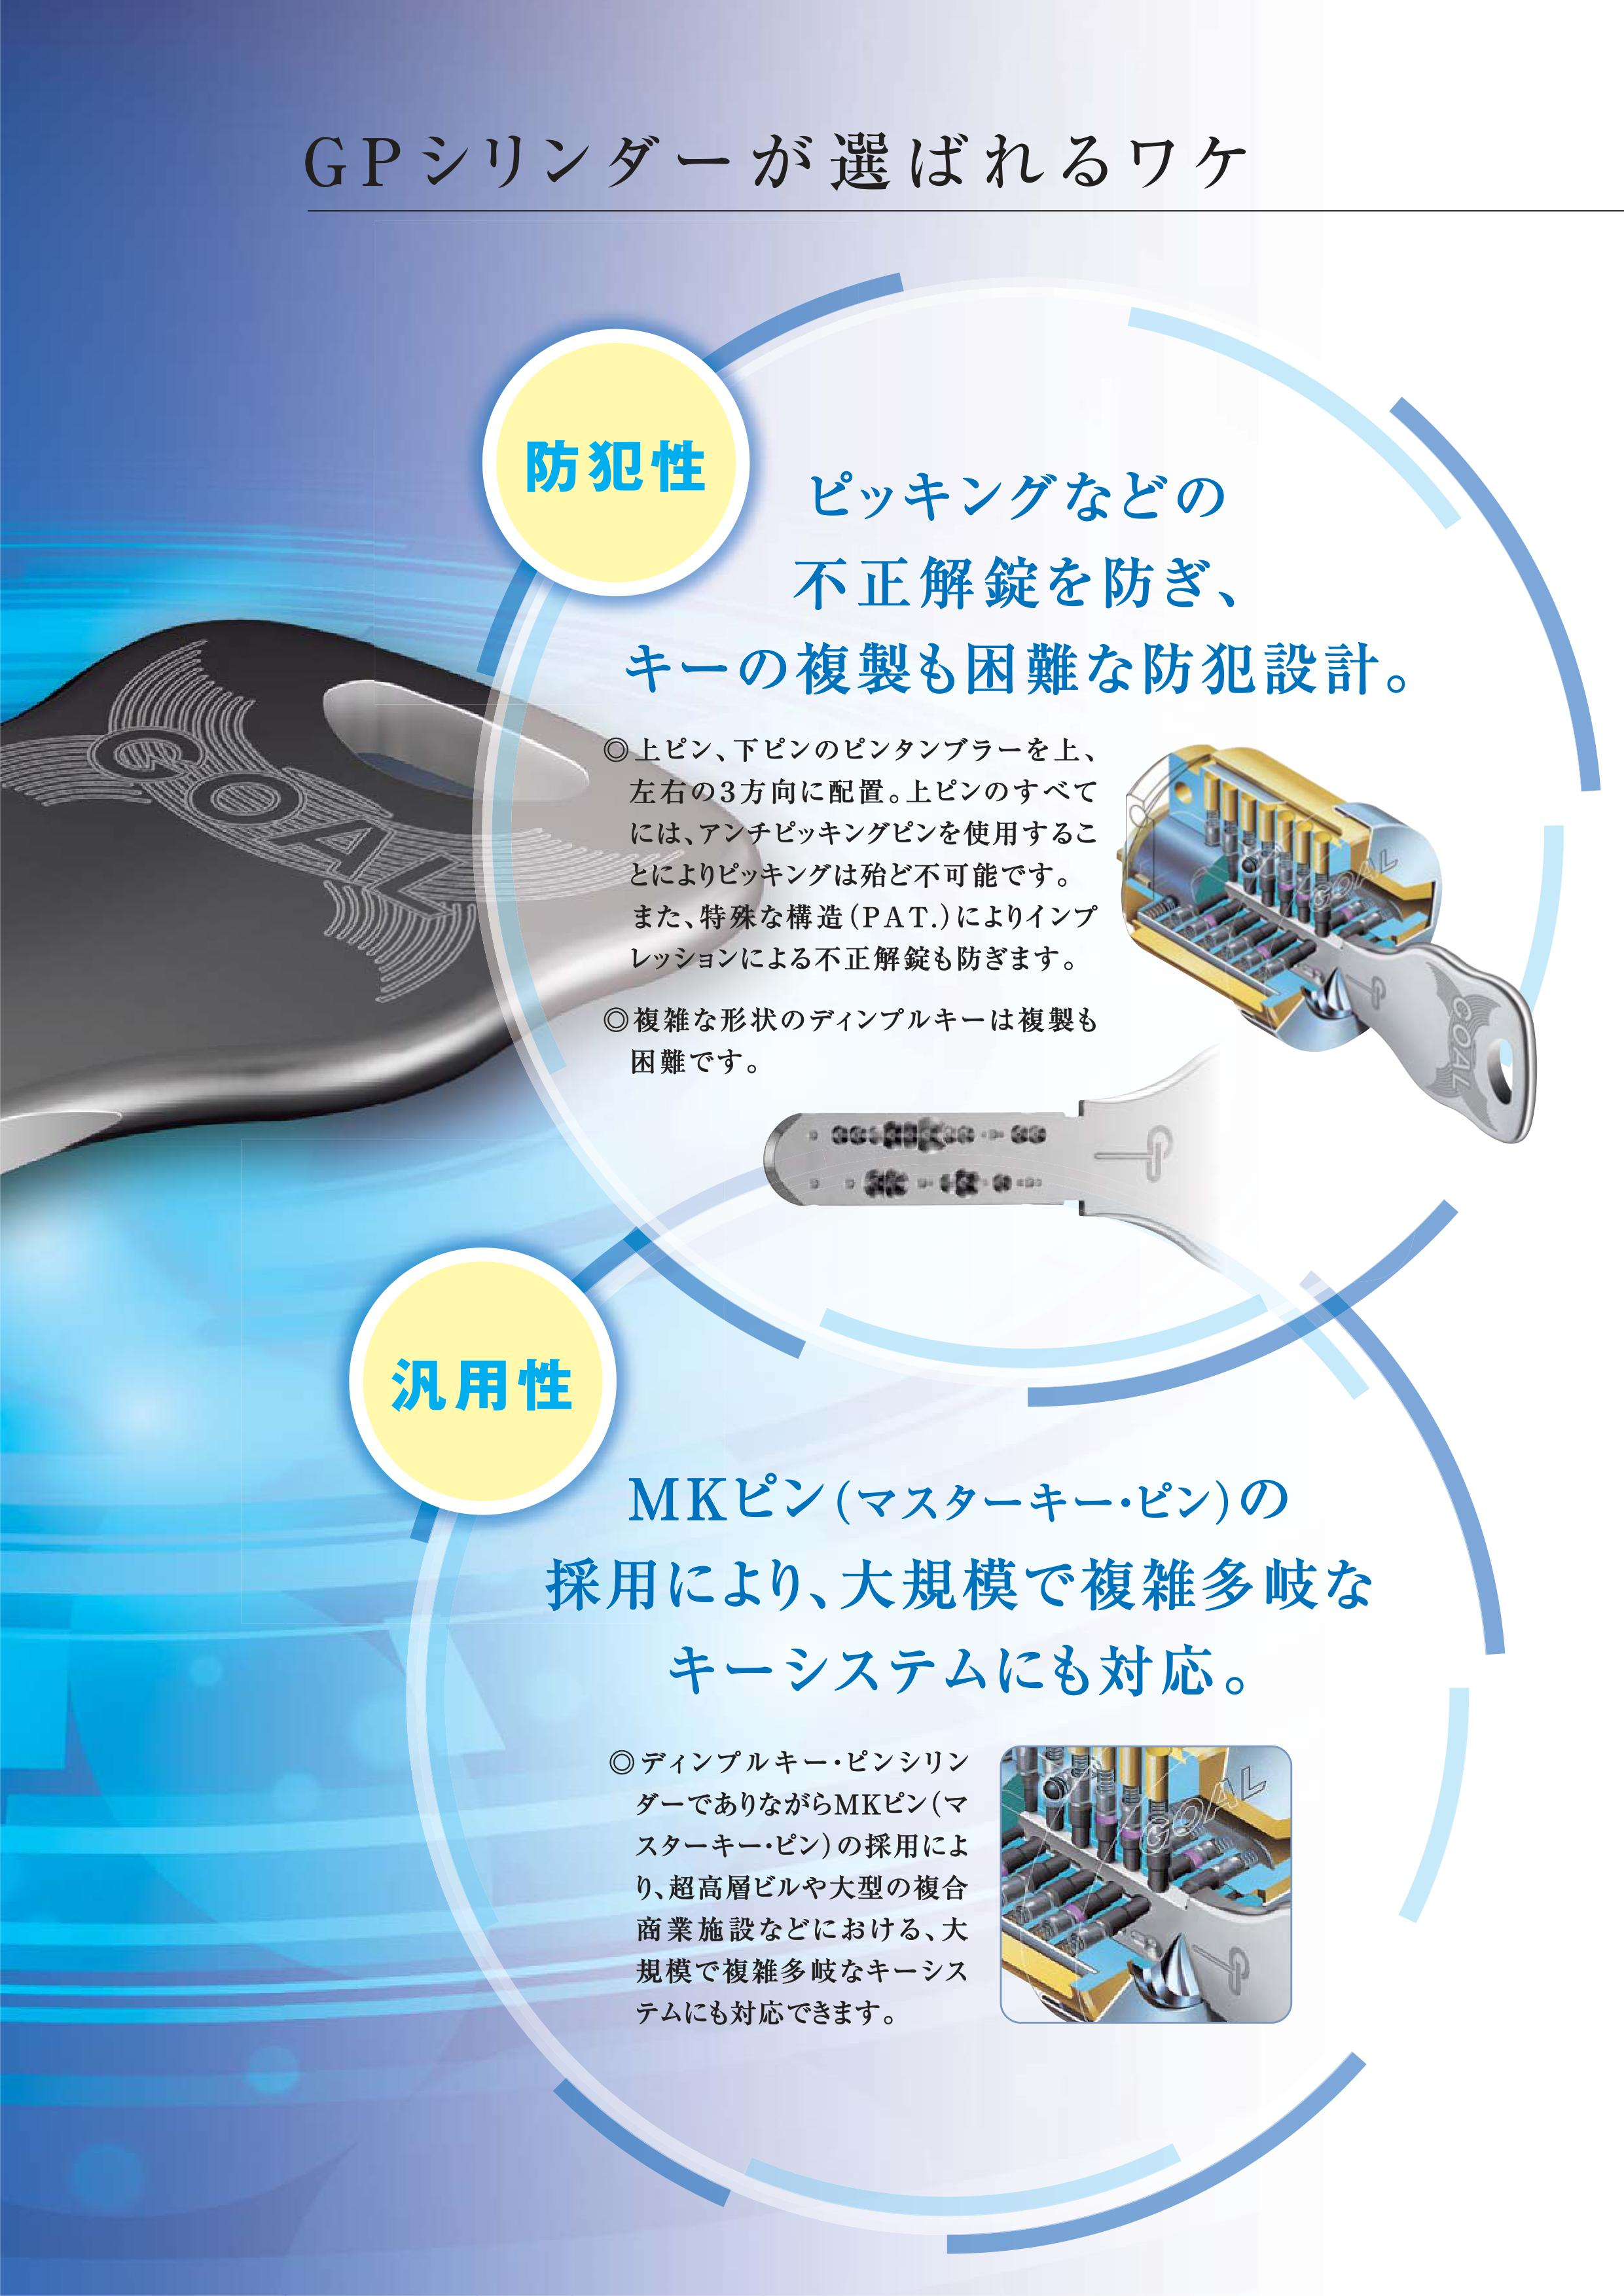 GOAL社「GPシリンダー」標準キー3本付き